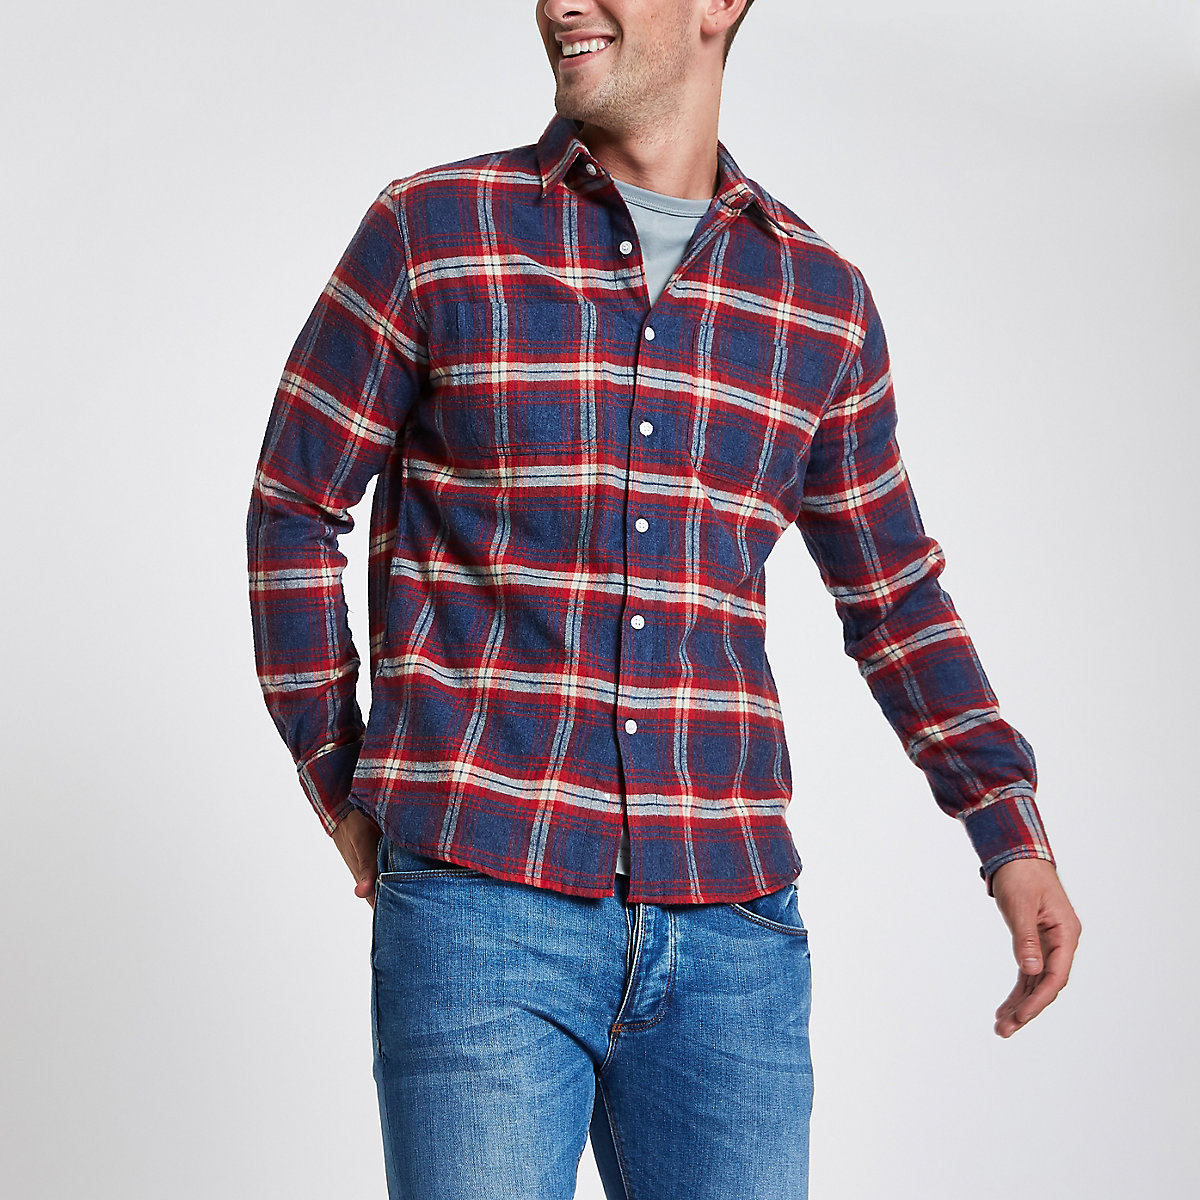 Bellfield – Rot kariertes, geknöpftes Hemd